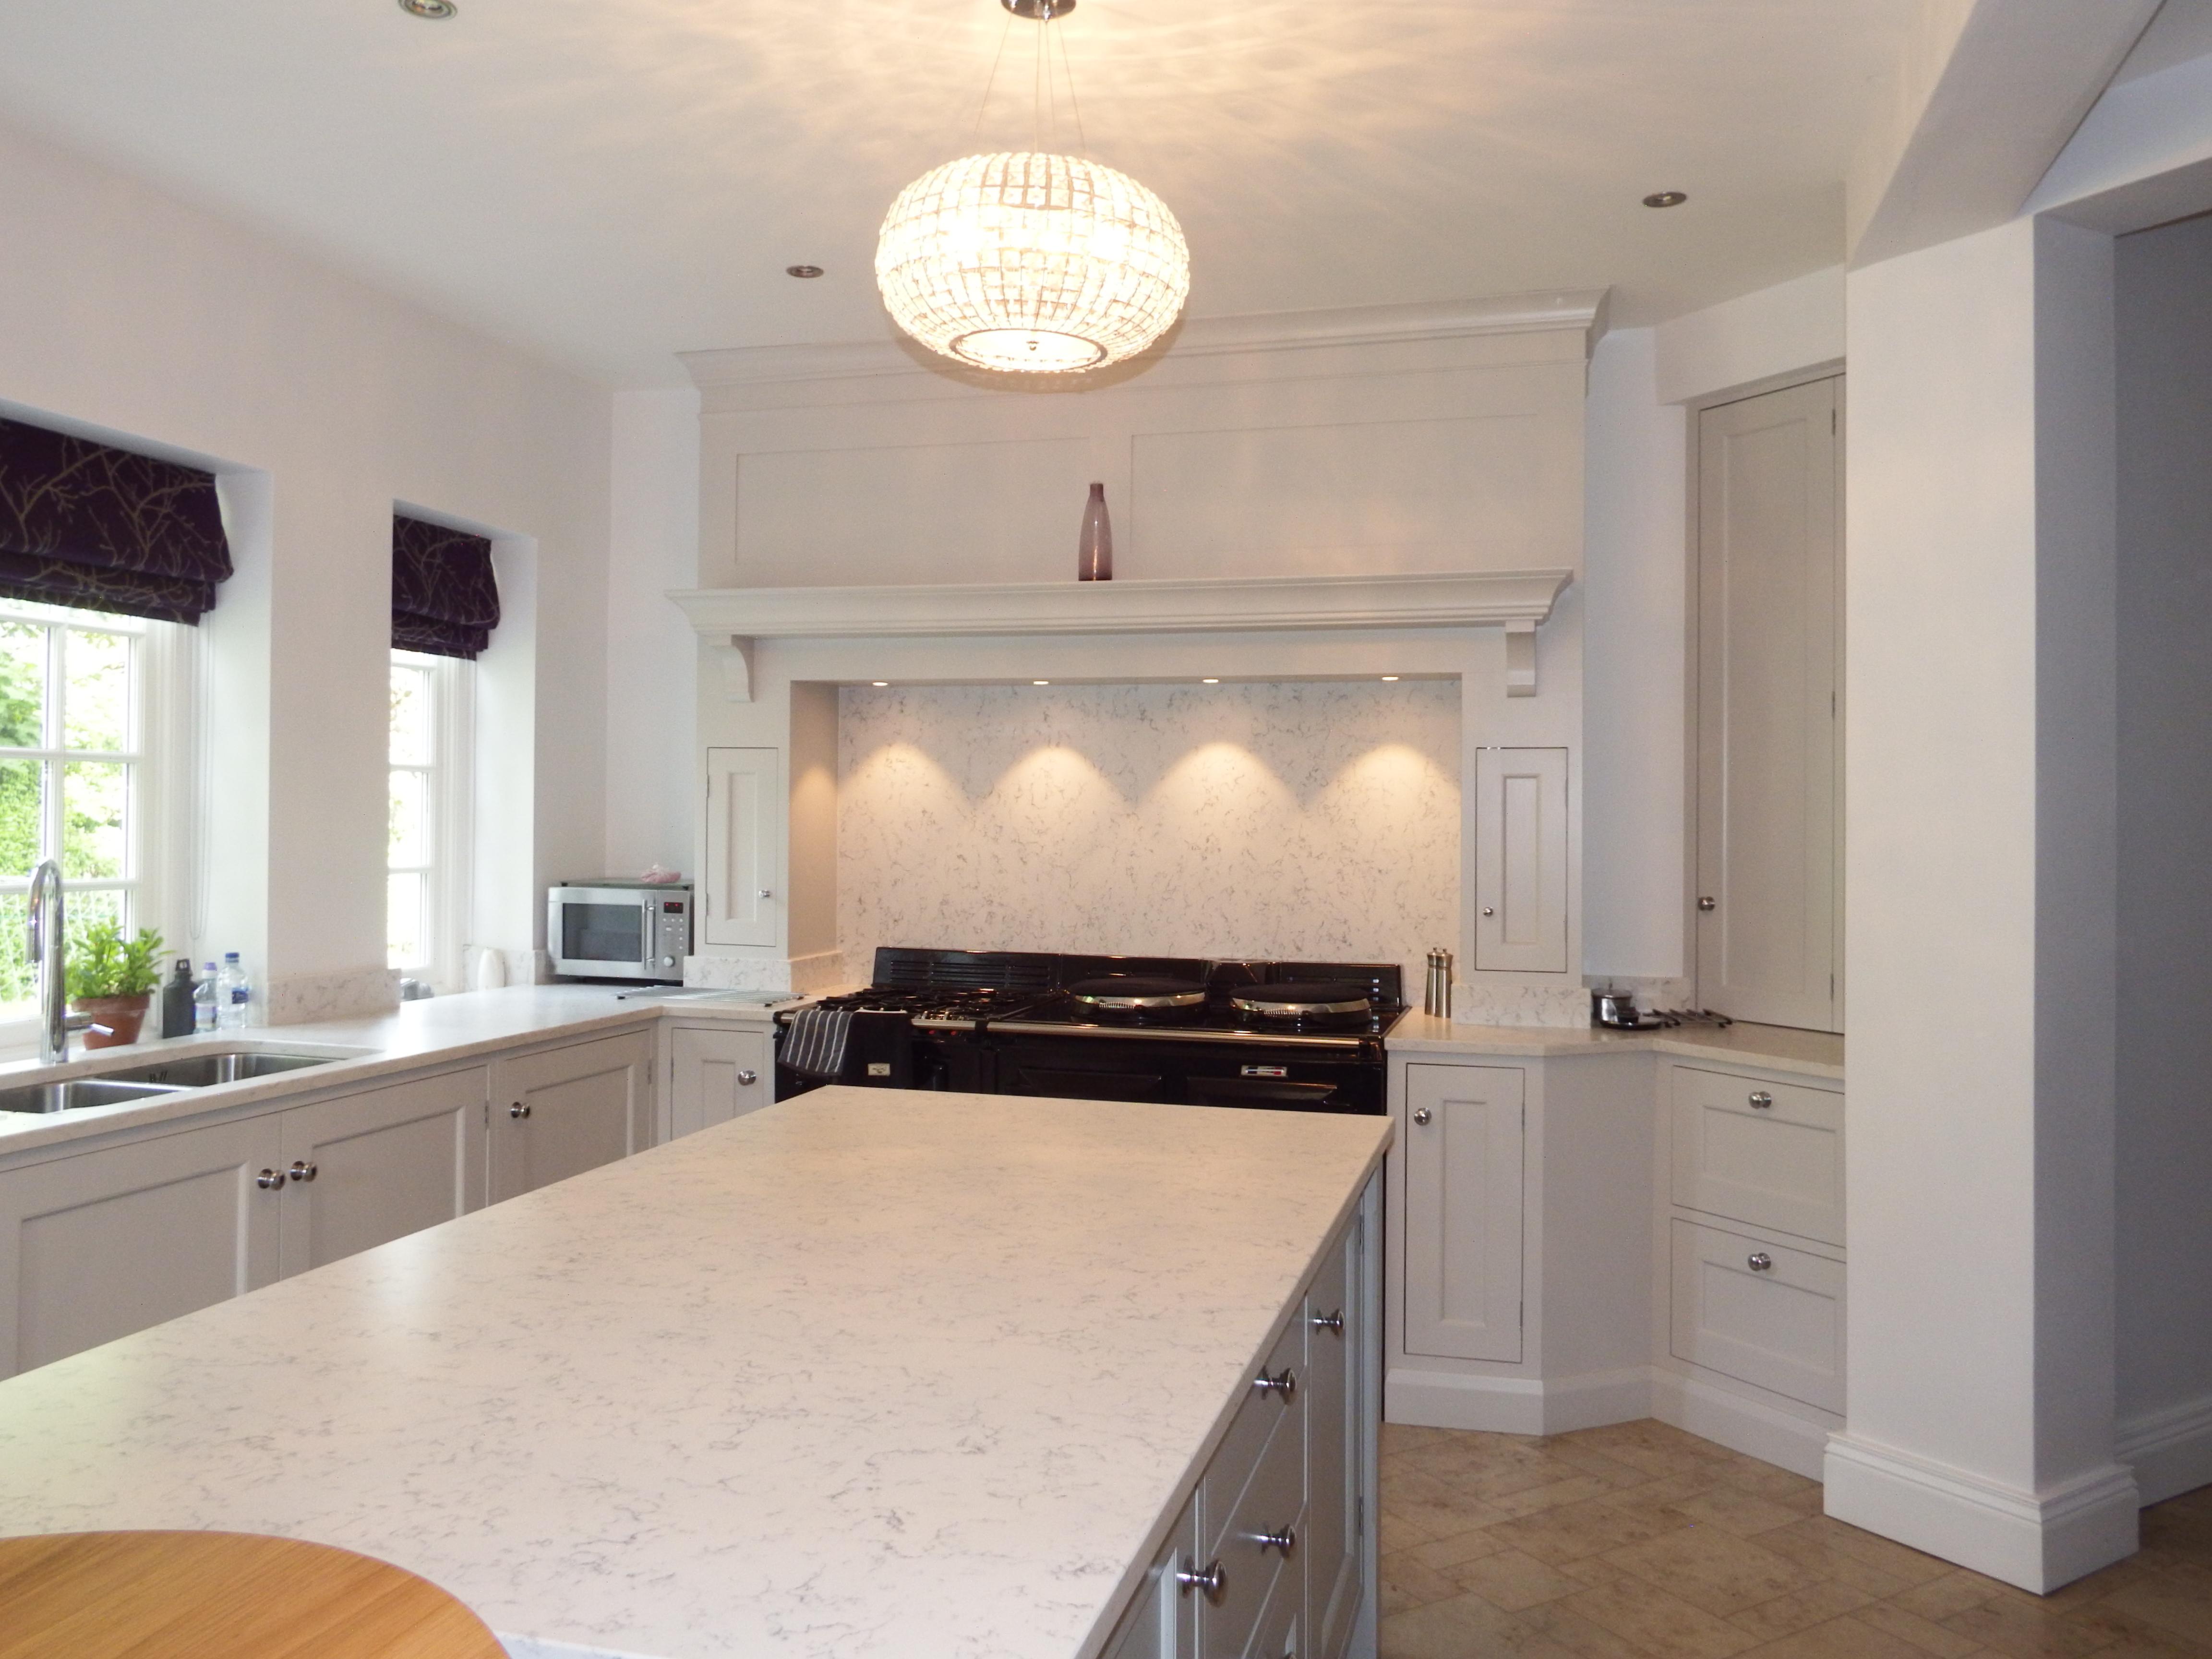 Harrogate kitchens inglish design bespoke furniture for Kitchen design yorkshire